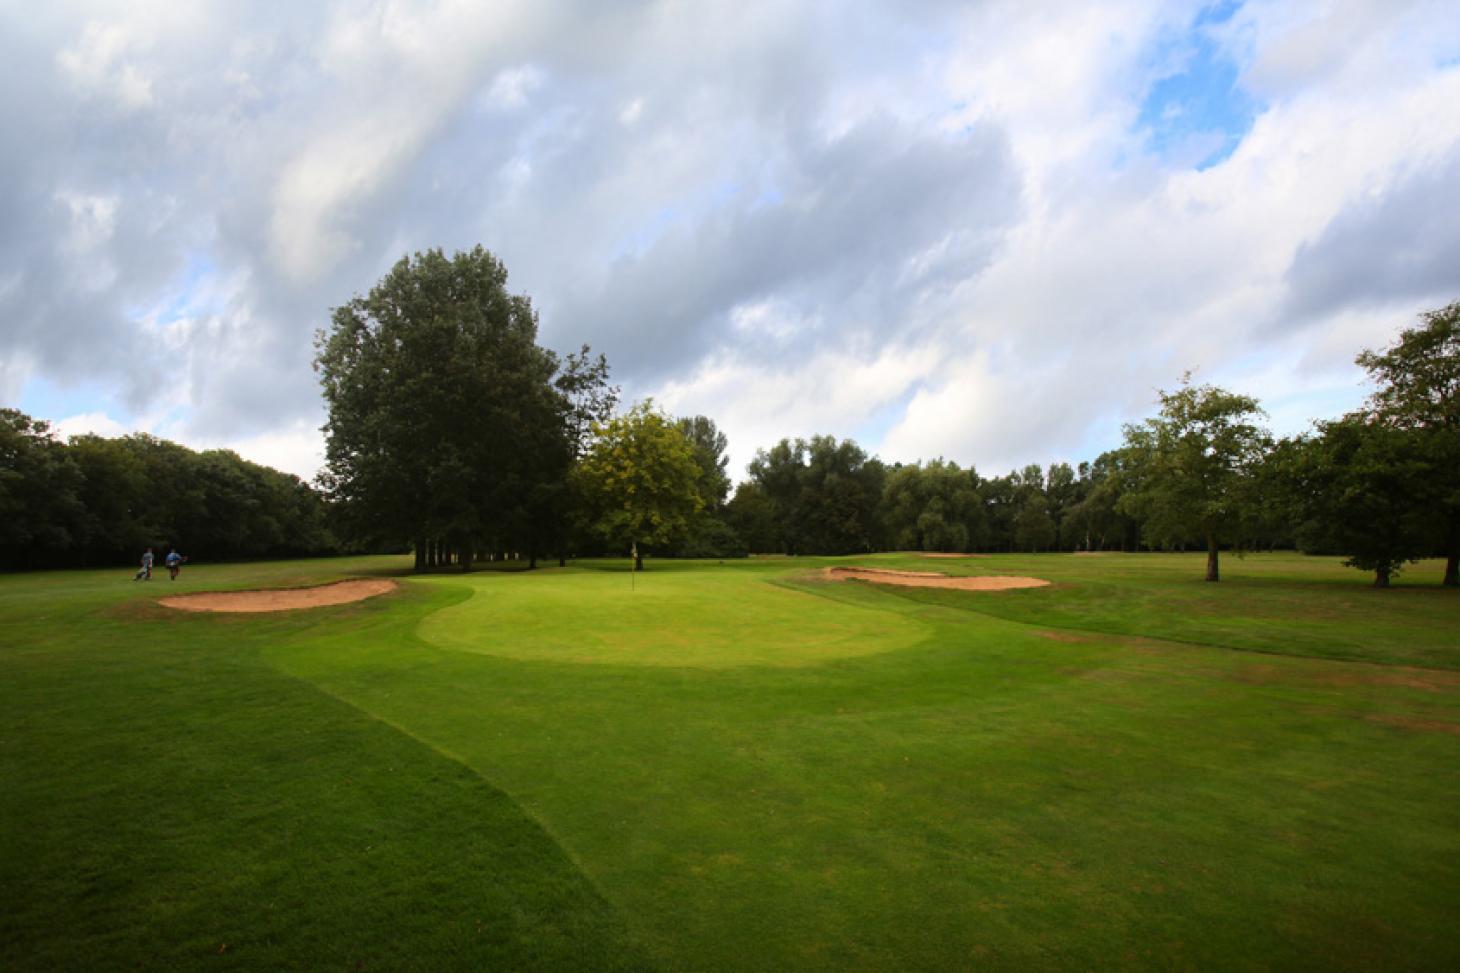 Ruislip Golf Club 18 hole golf course